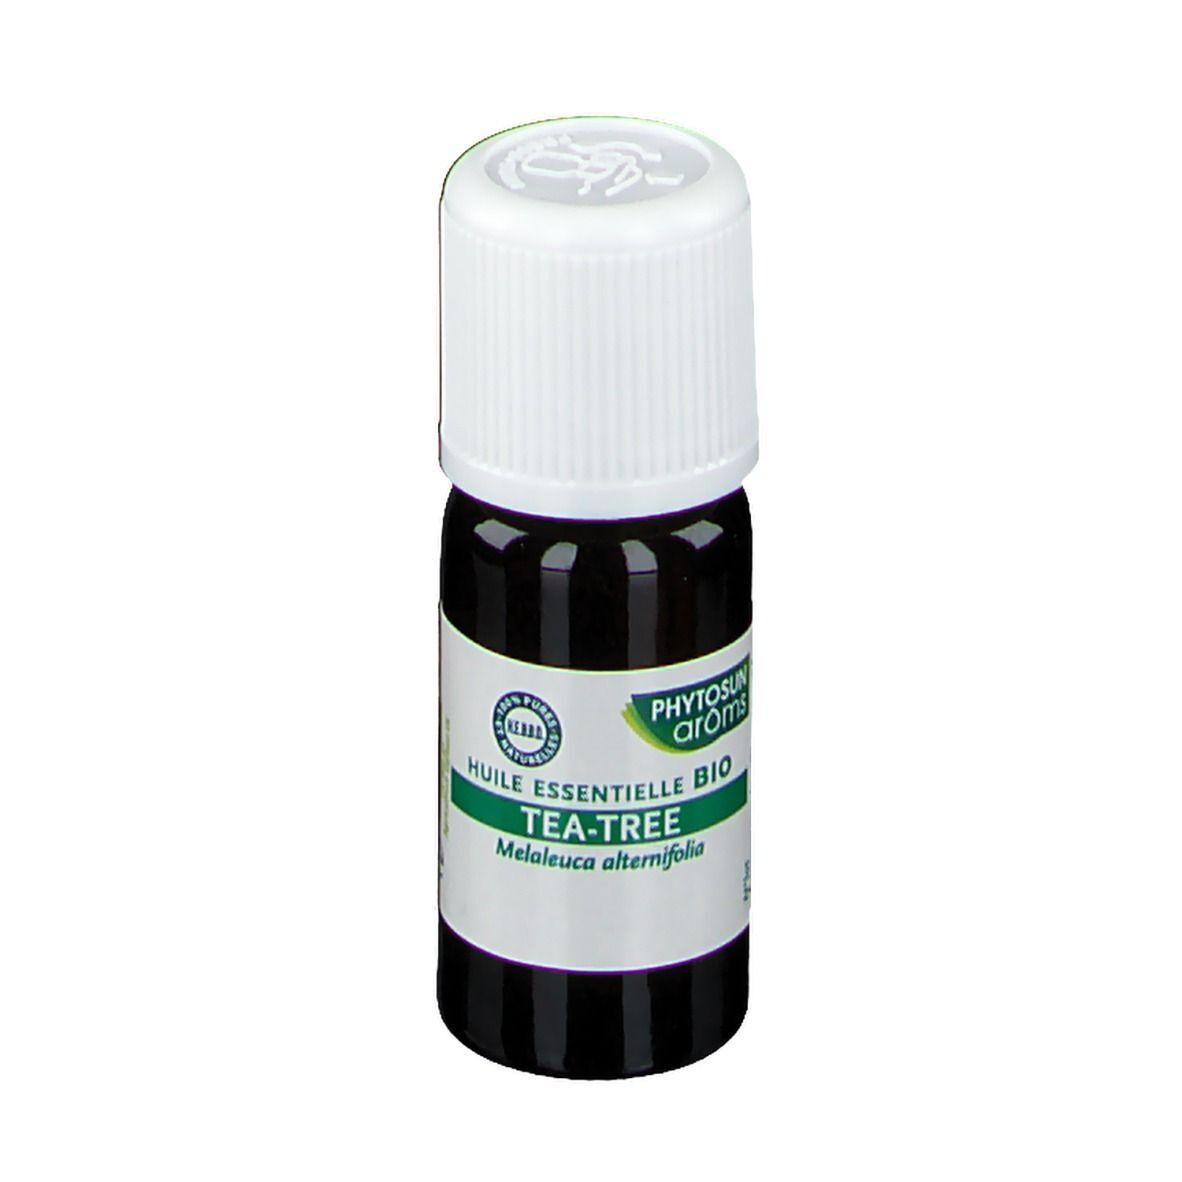 Phytosun arôms Phytosun Aroms huile essentielle Tea Tree Bio ml huile